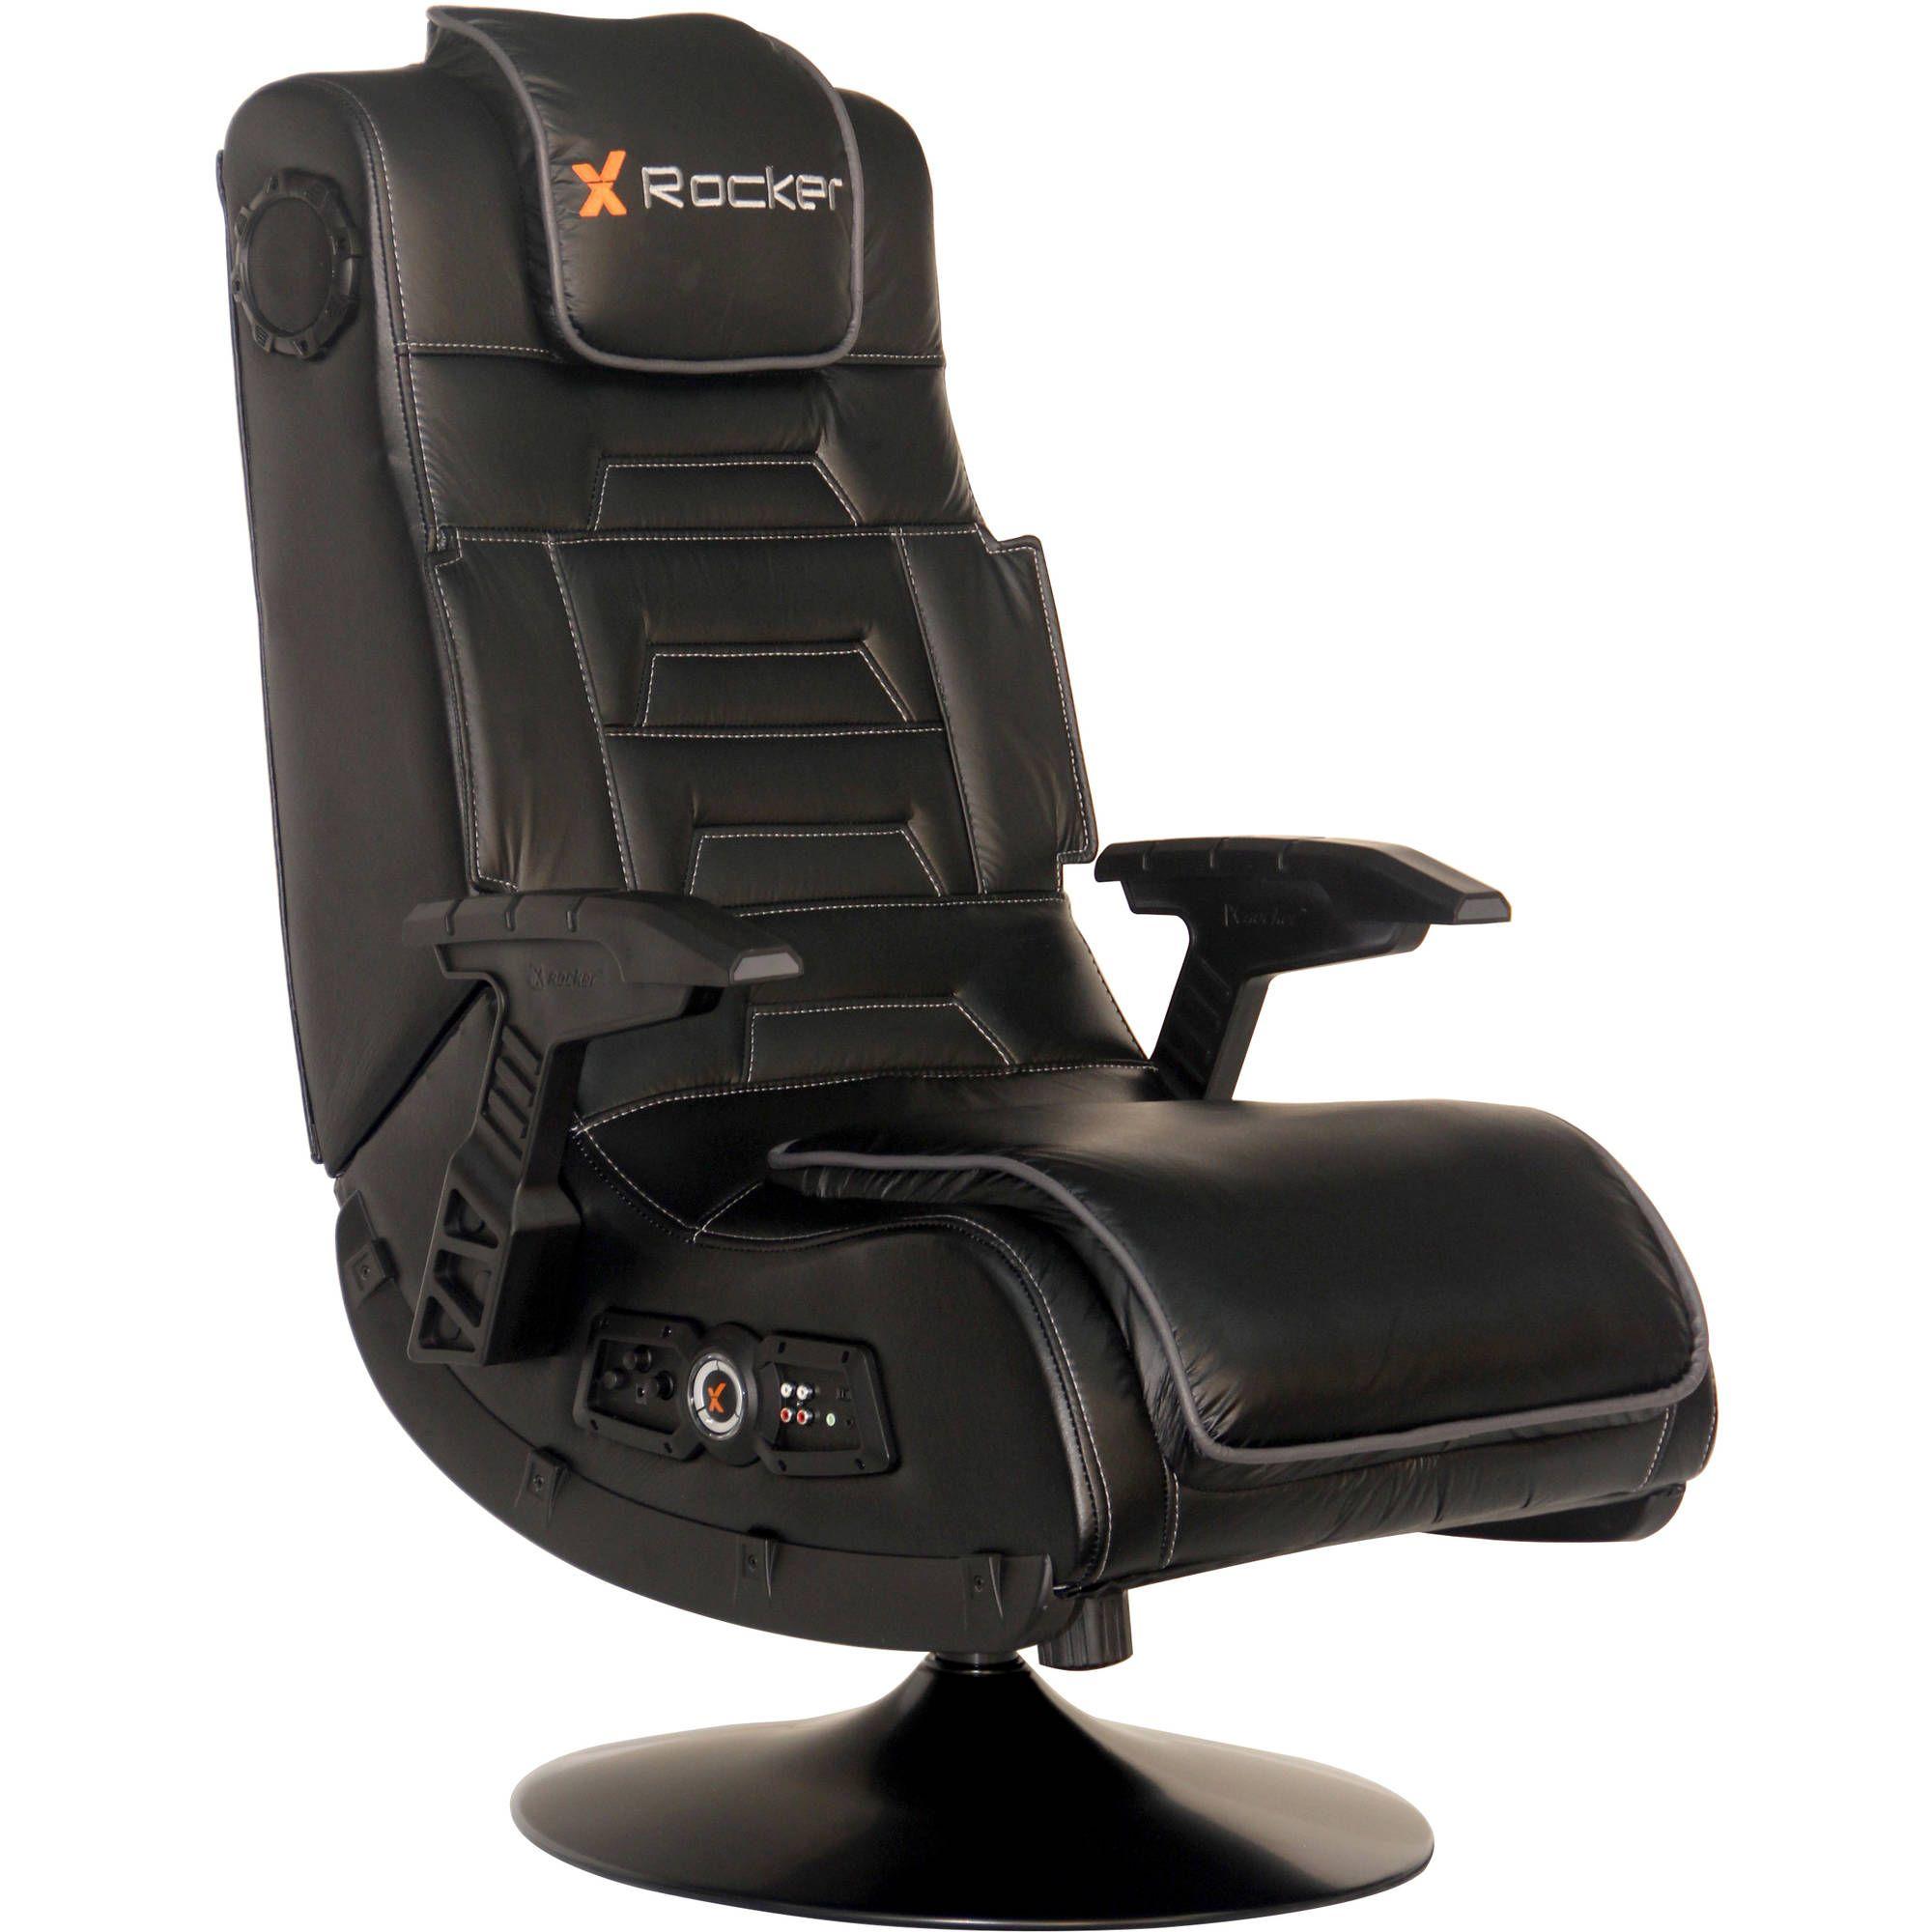 X Rocker Pro Series Pedestal Wireless 2 1 Gaming Chair Rocker Black Walmart Com In 2020 Gaming Chair Gamer Chair Rocking Chair